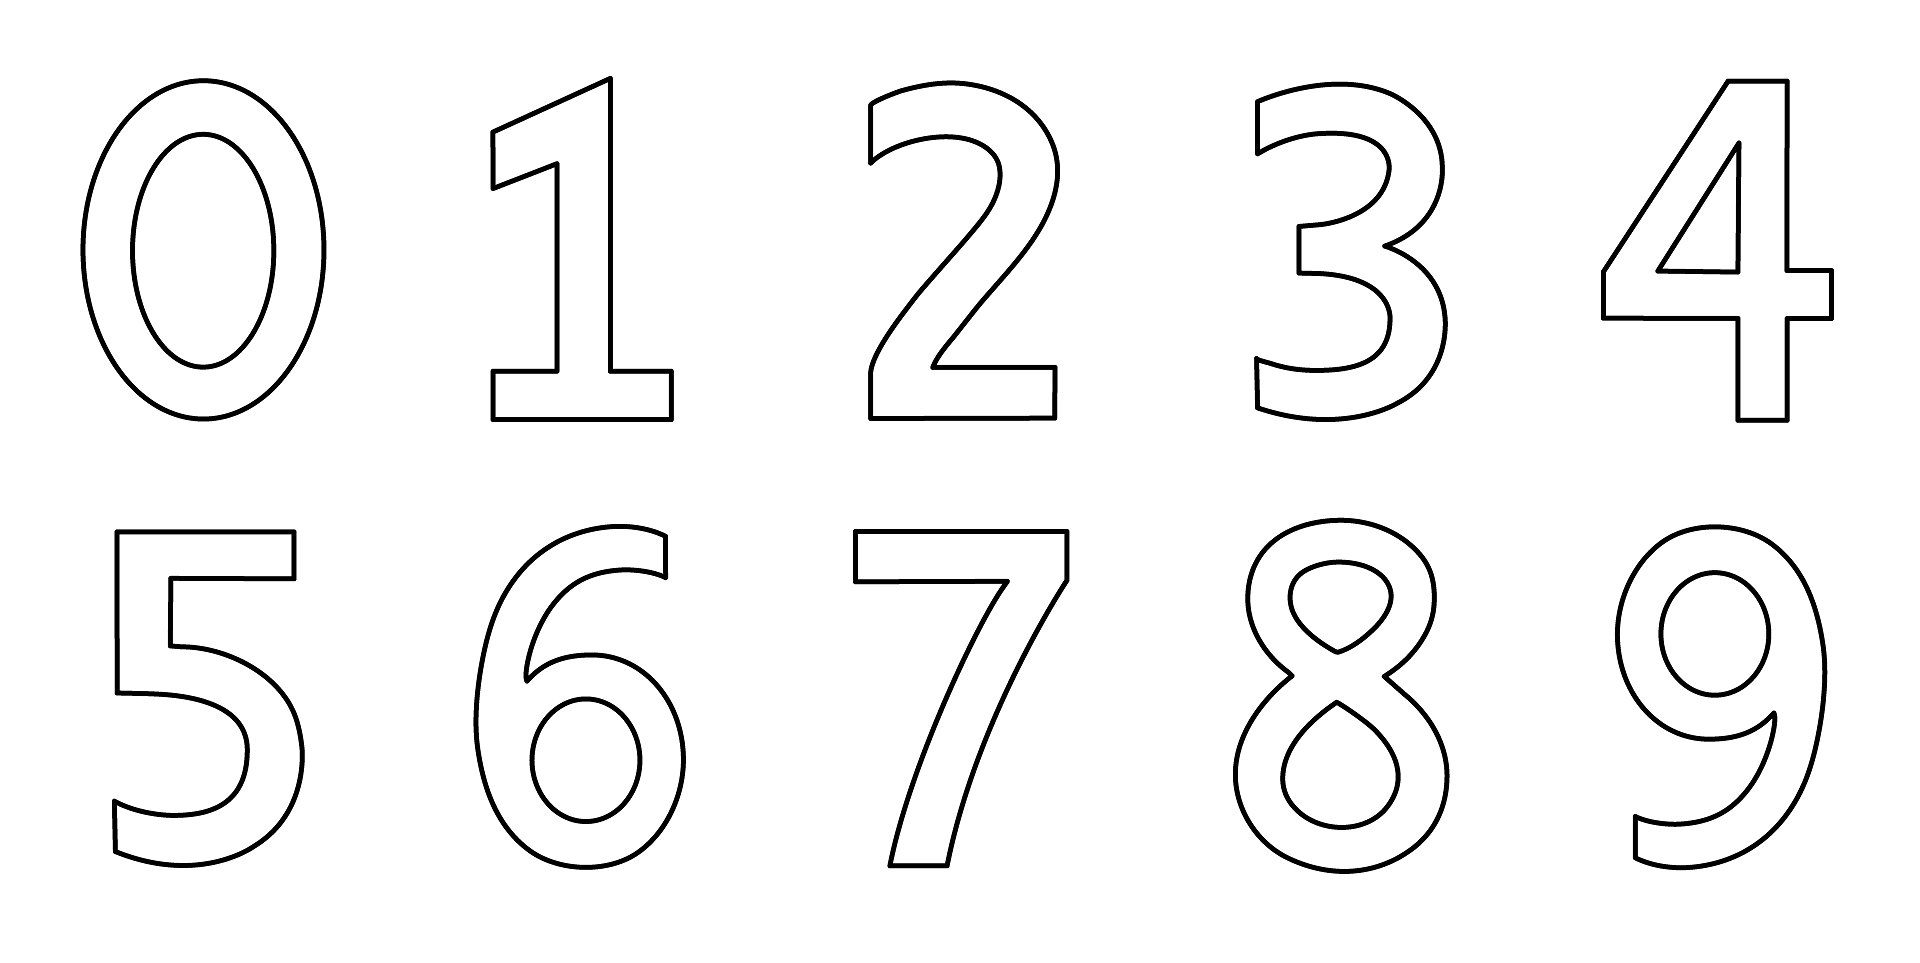 Dibujos De Números Para Colorear E Imprimir Gratis, Números Del 1